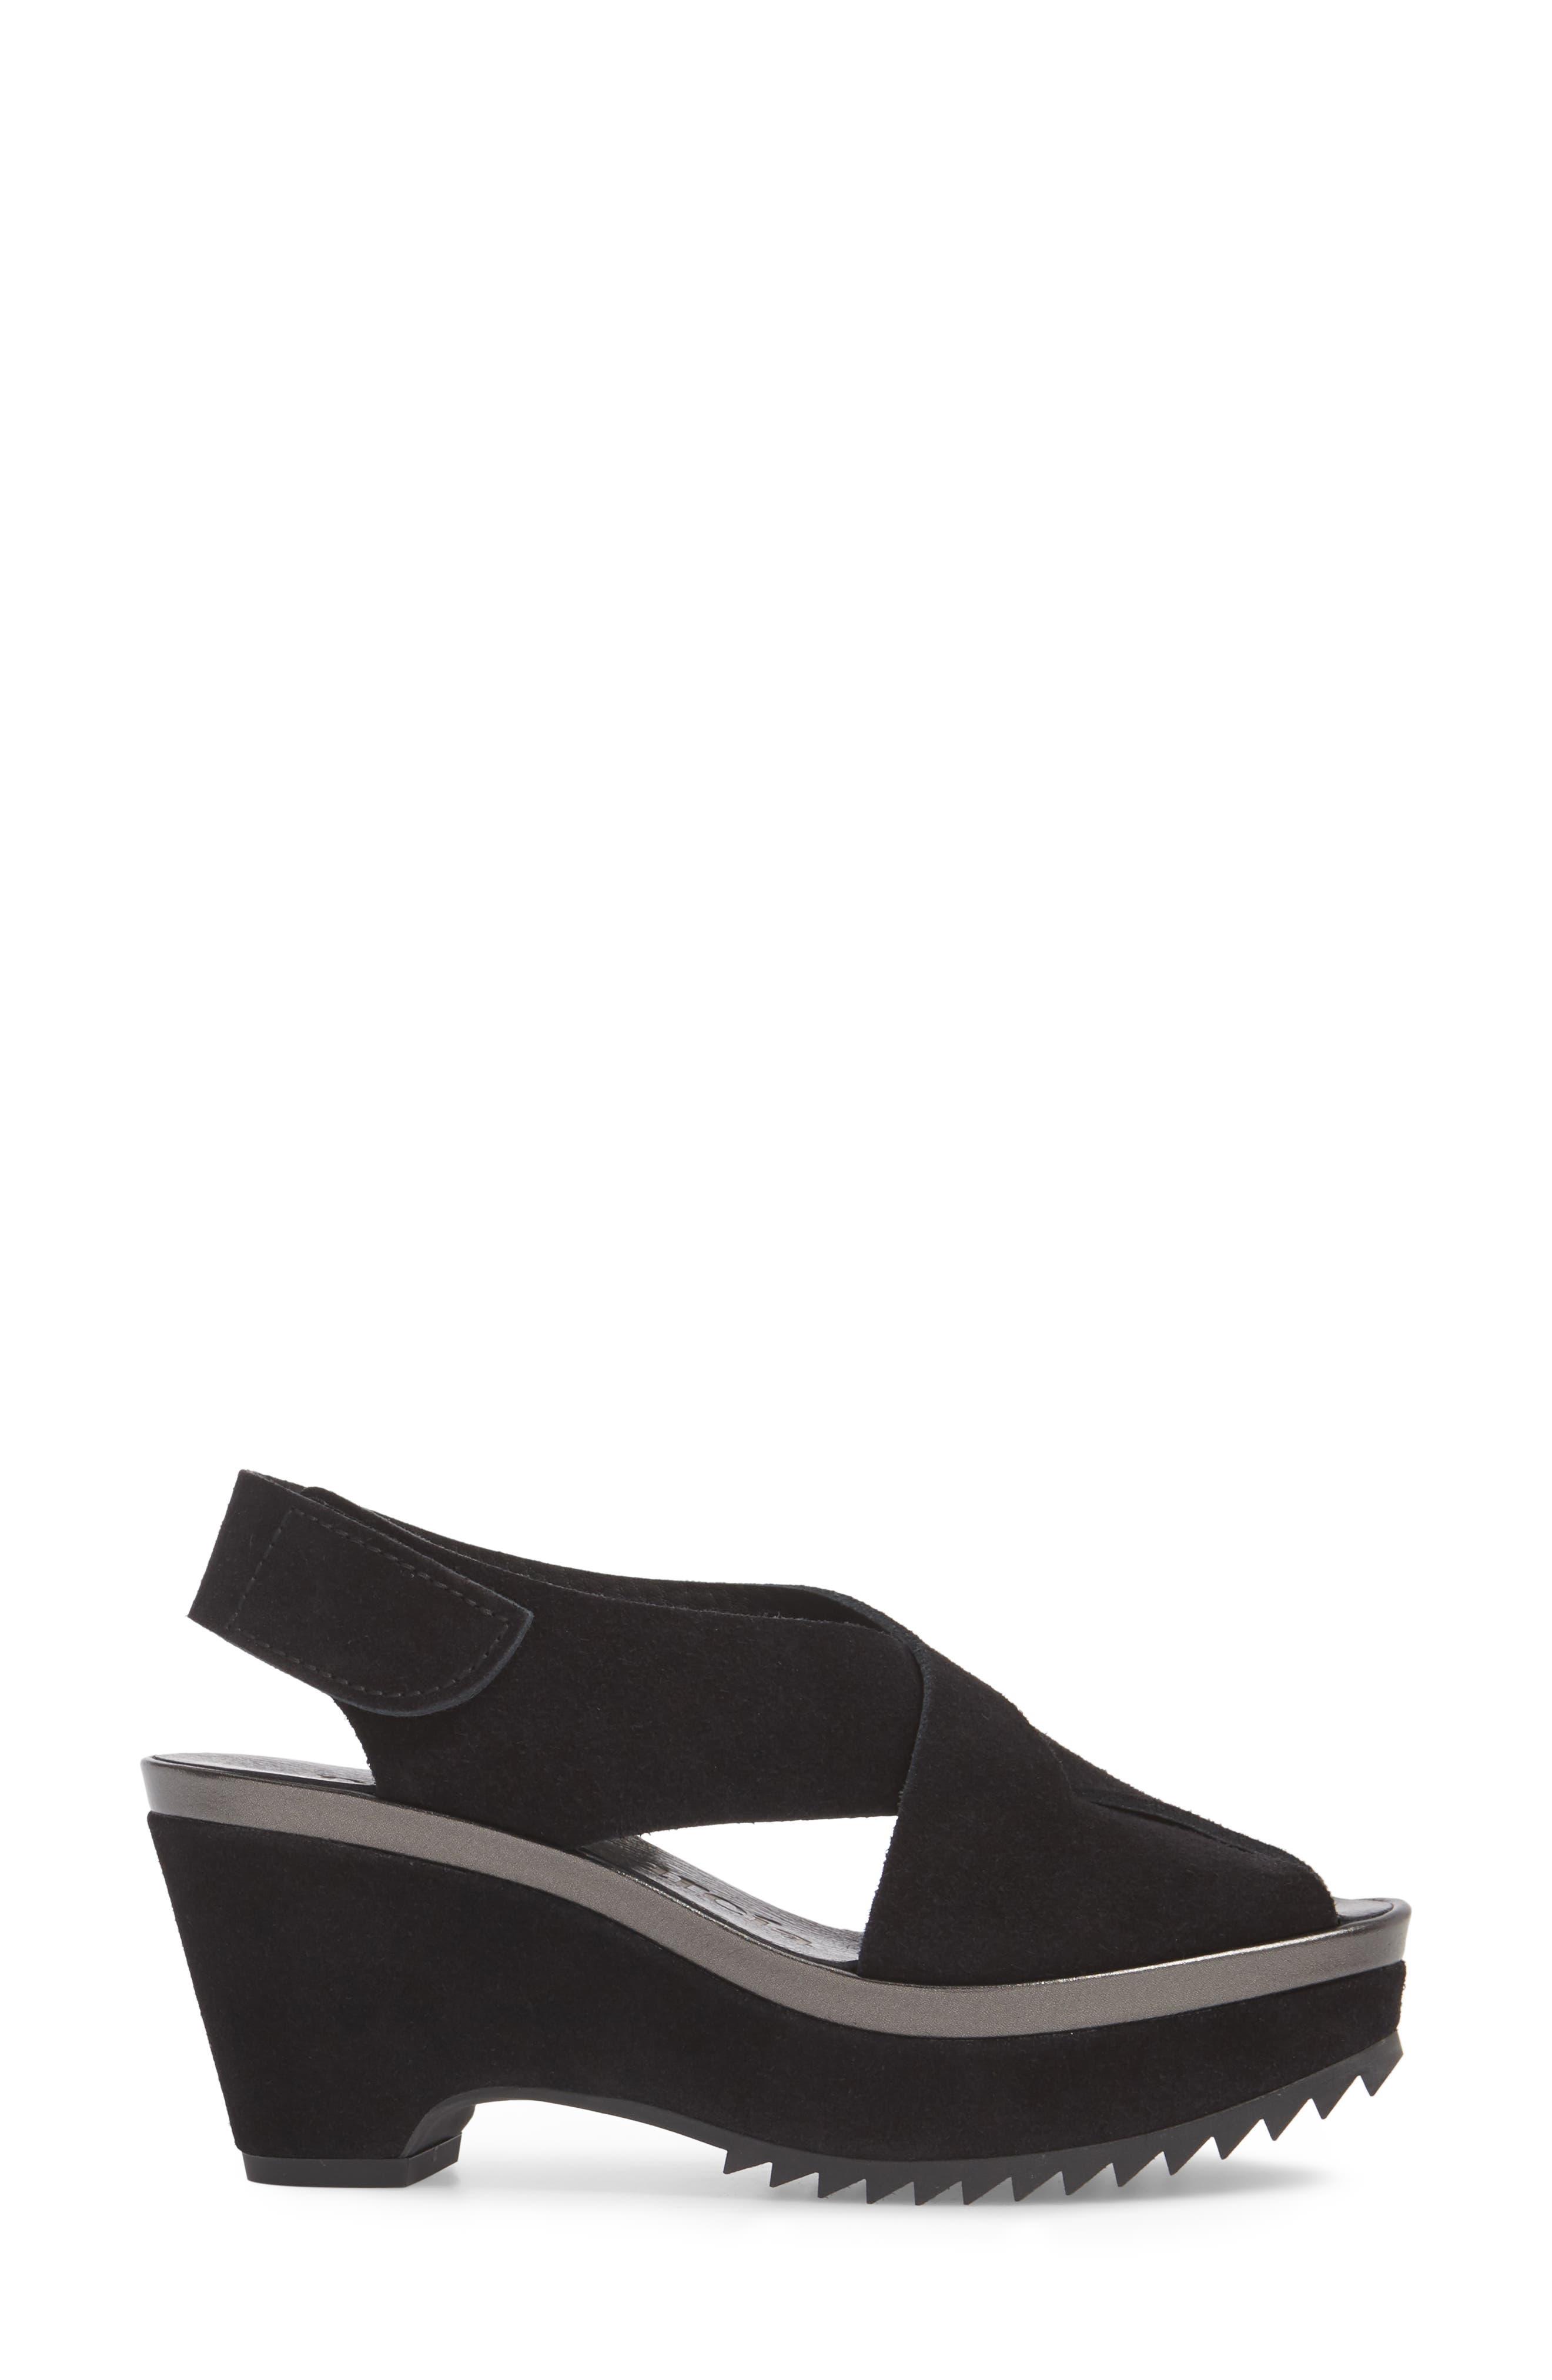 Fayre Cross Strap Wedge Sandal,                             Alternate thumbnail 3, color,                             BLACK